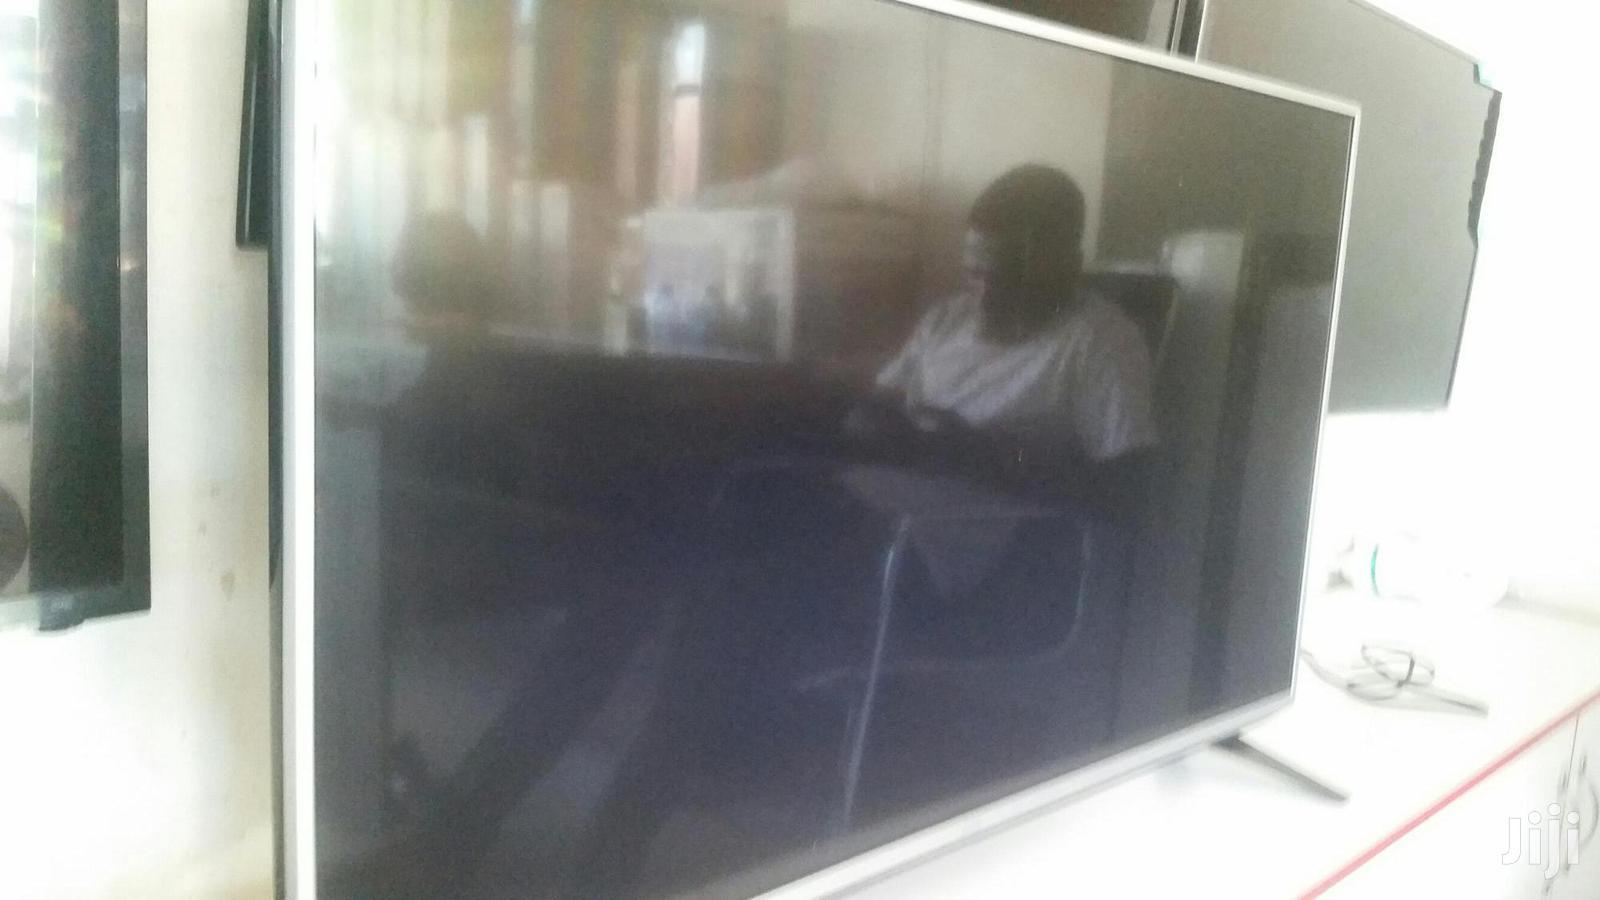 LG Flat Screen Tv 43 Inches | TV & DVD Equipment for sale in Kampala, Uganda